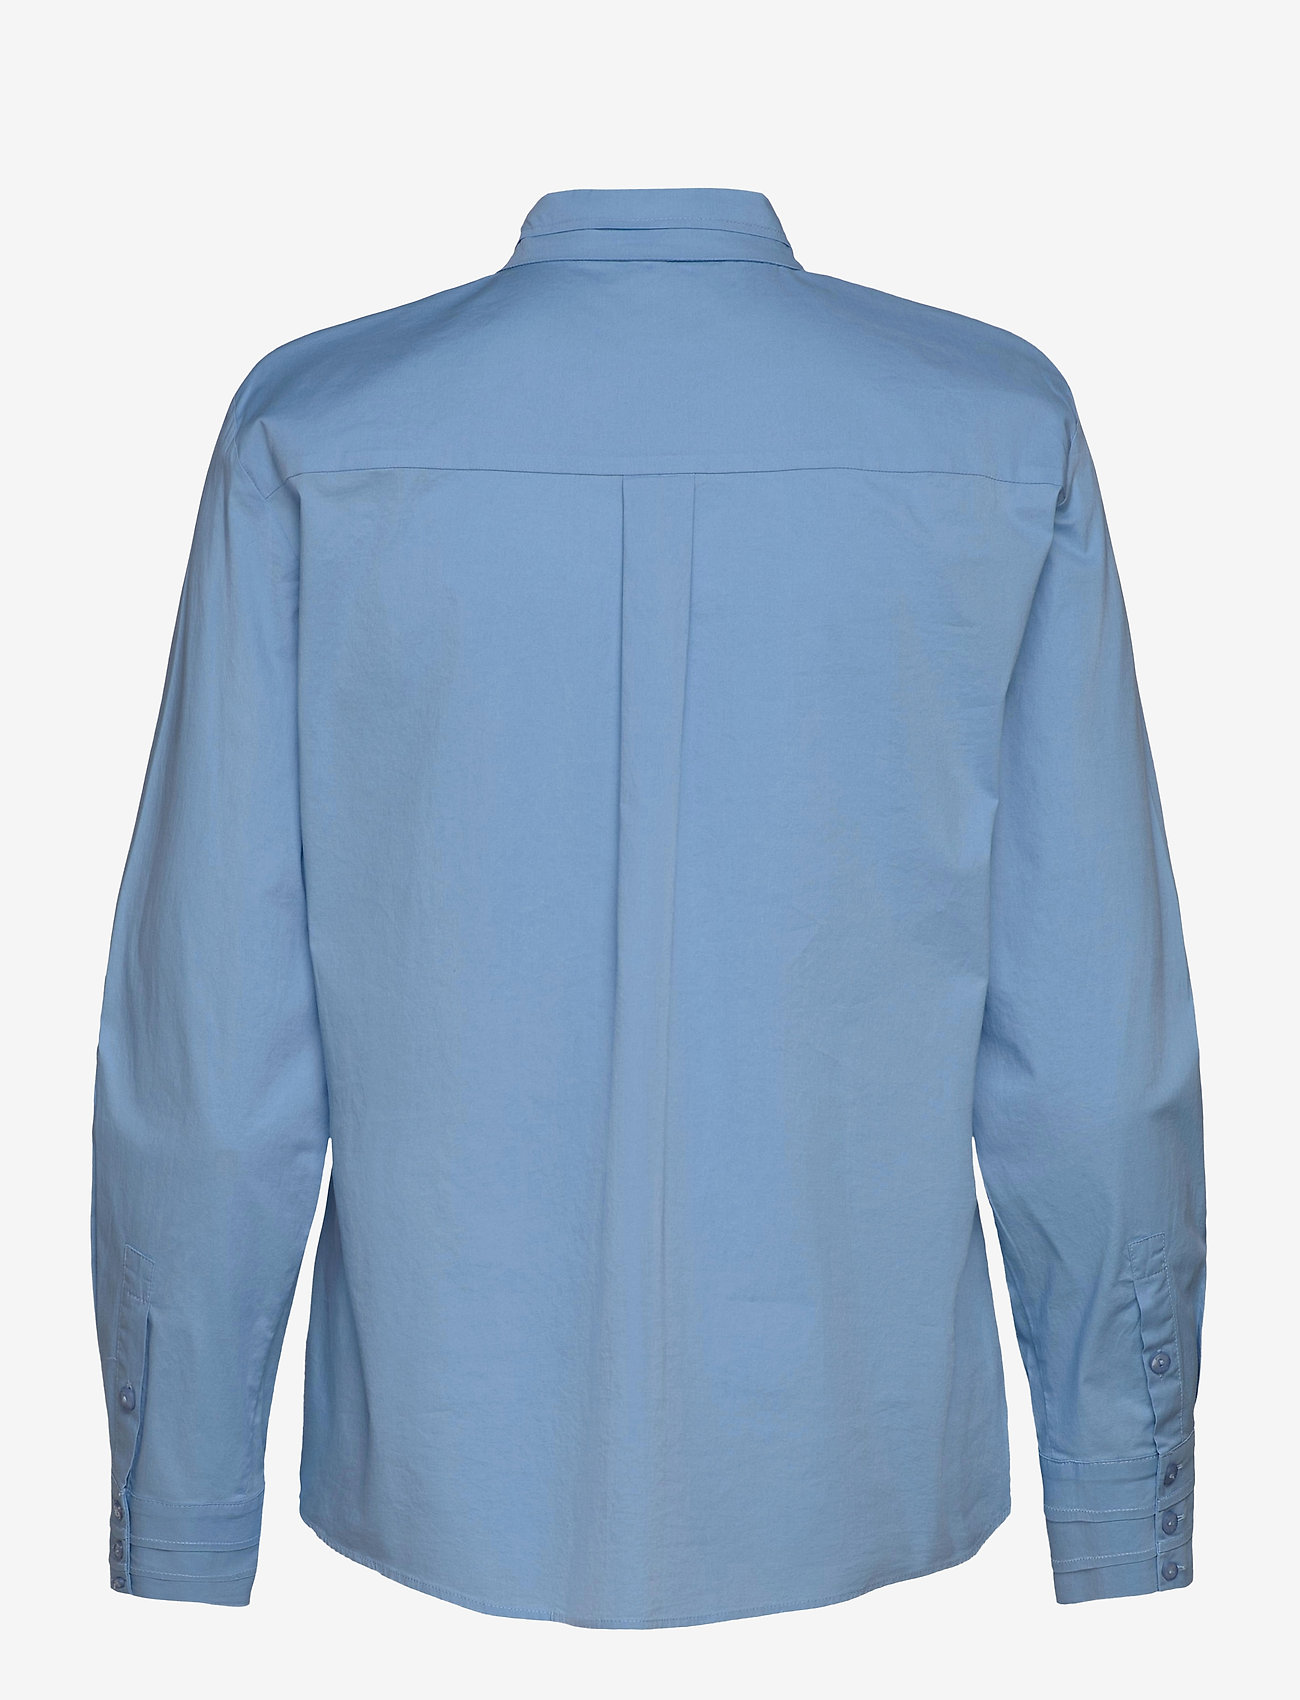 Gerry Weber Edition - BLOUSE LONG-SLEEVE - chemises à manches longues - wave - 1